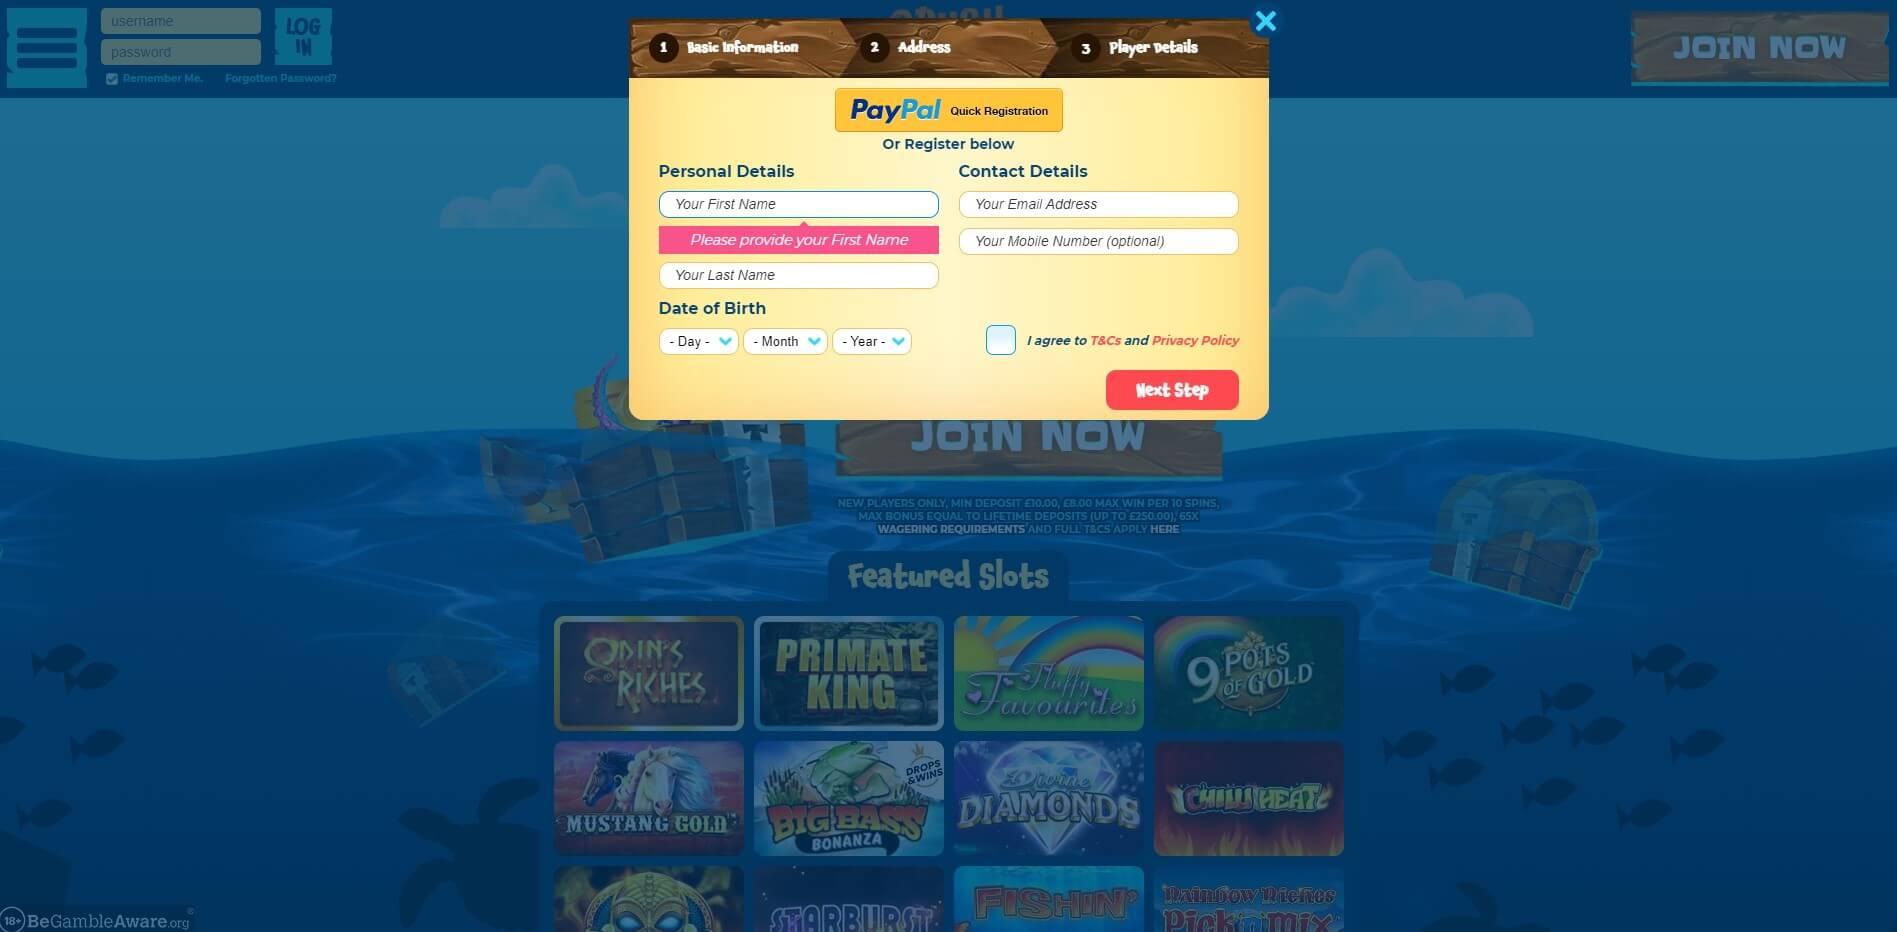 Sign Up at CrushWins Casino